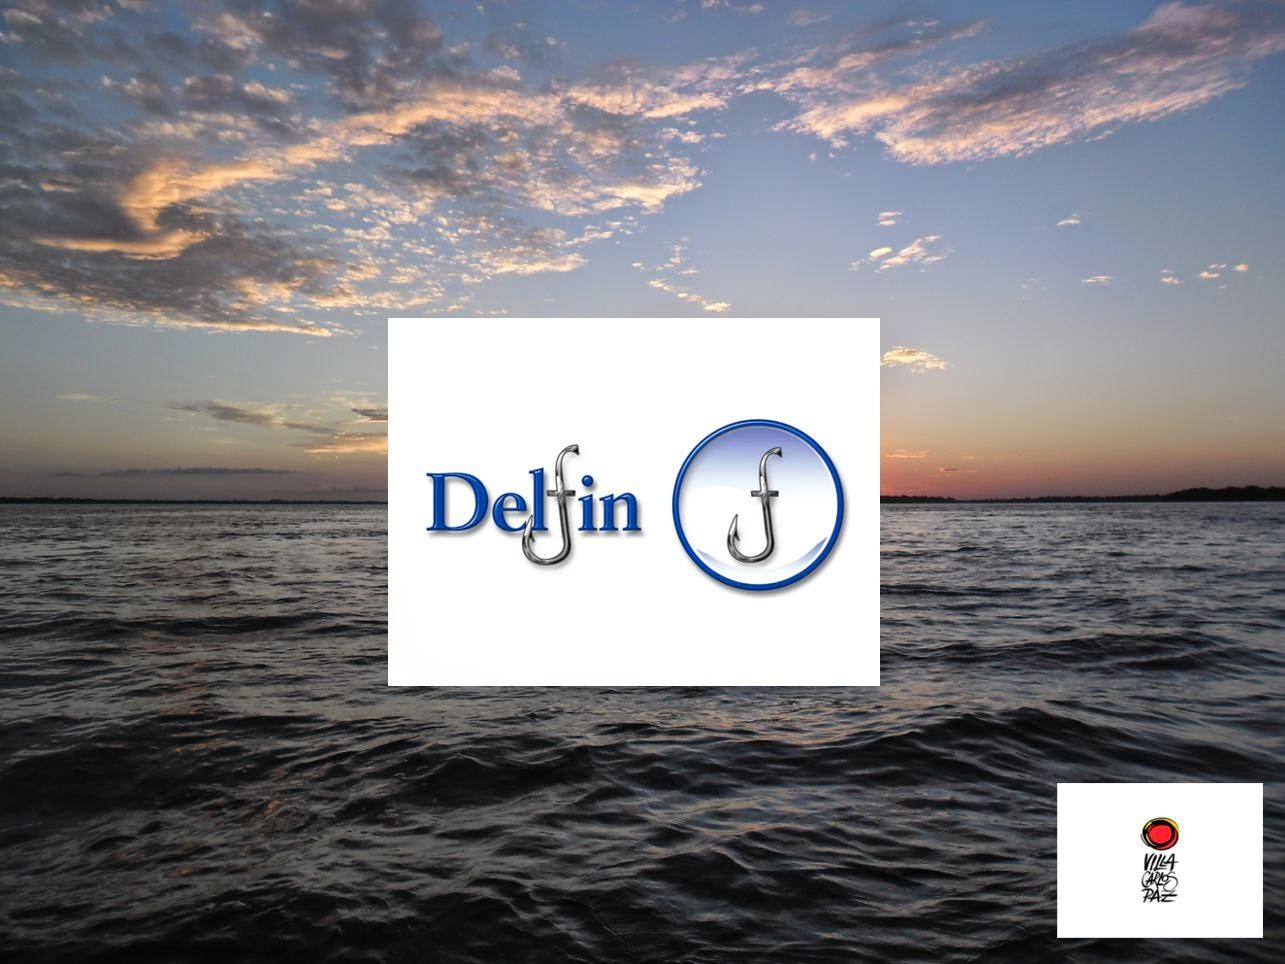 DELFIN - PESCA & AVENTURA